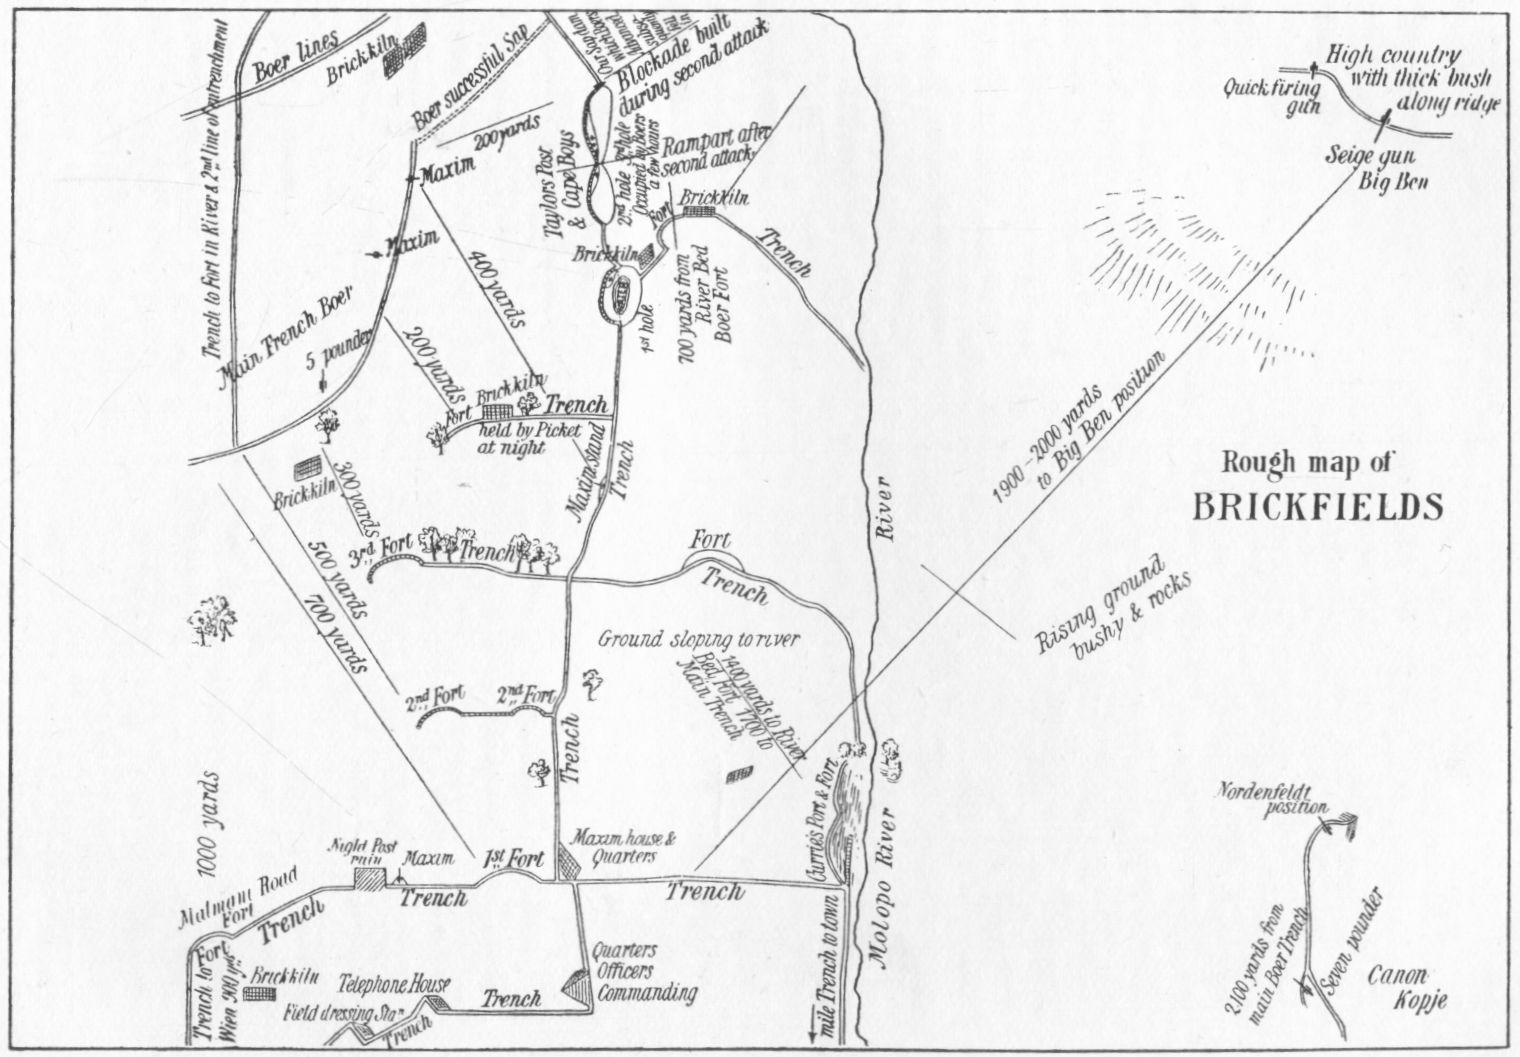 Brickfieldsplan.jpg